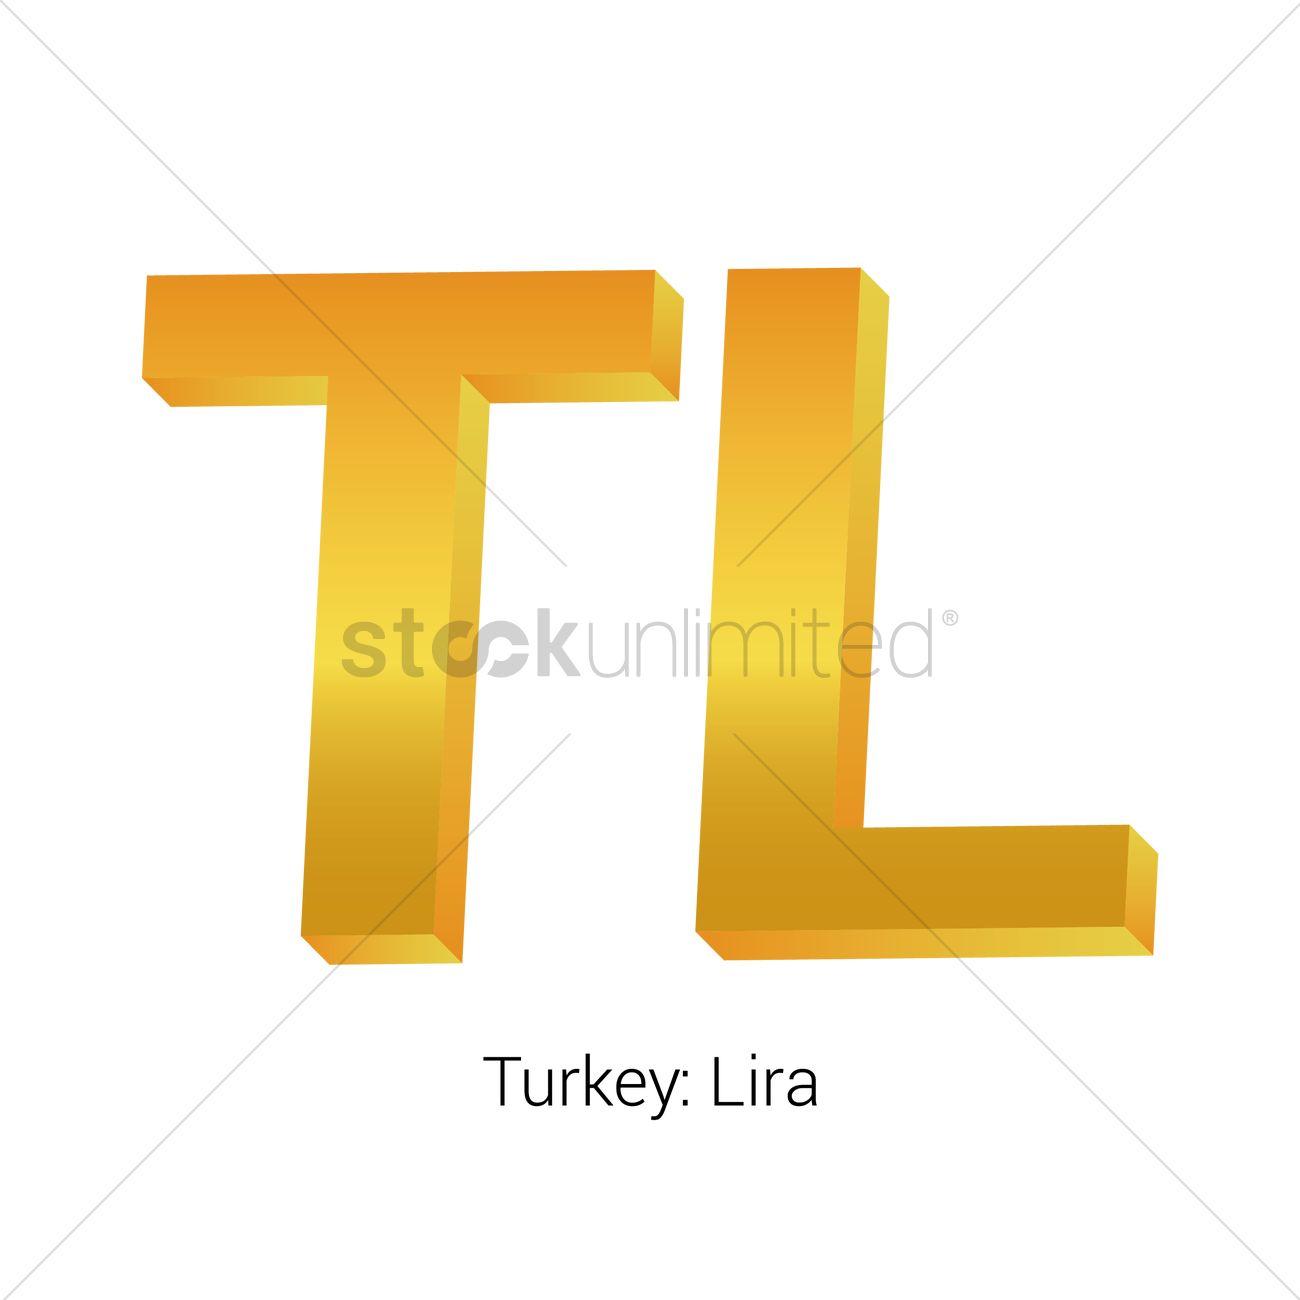 Lira currency symbol vector image 1821566 stockunlimited lira currency symbol vector graphic buycottarizona